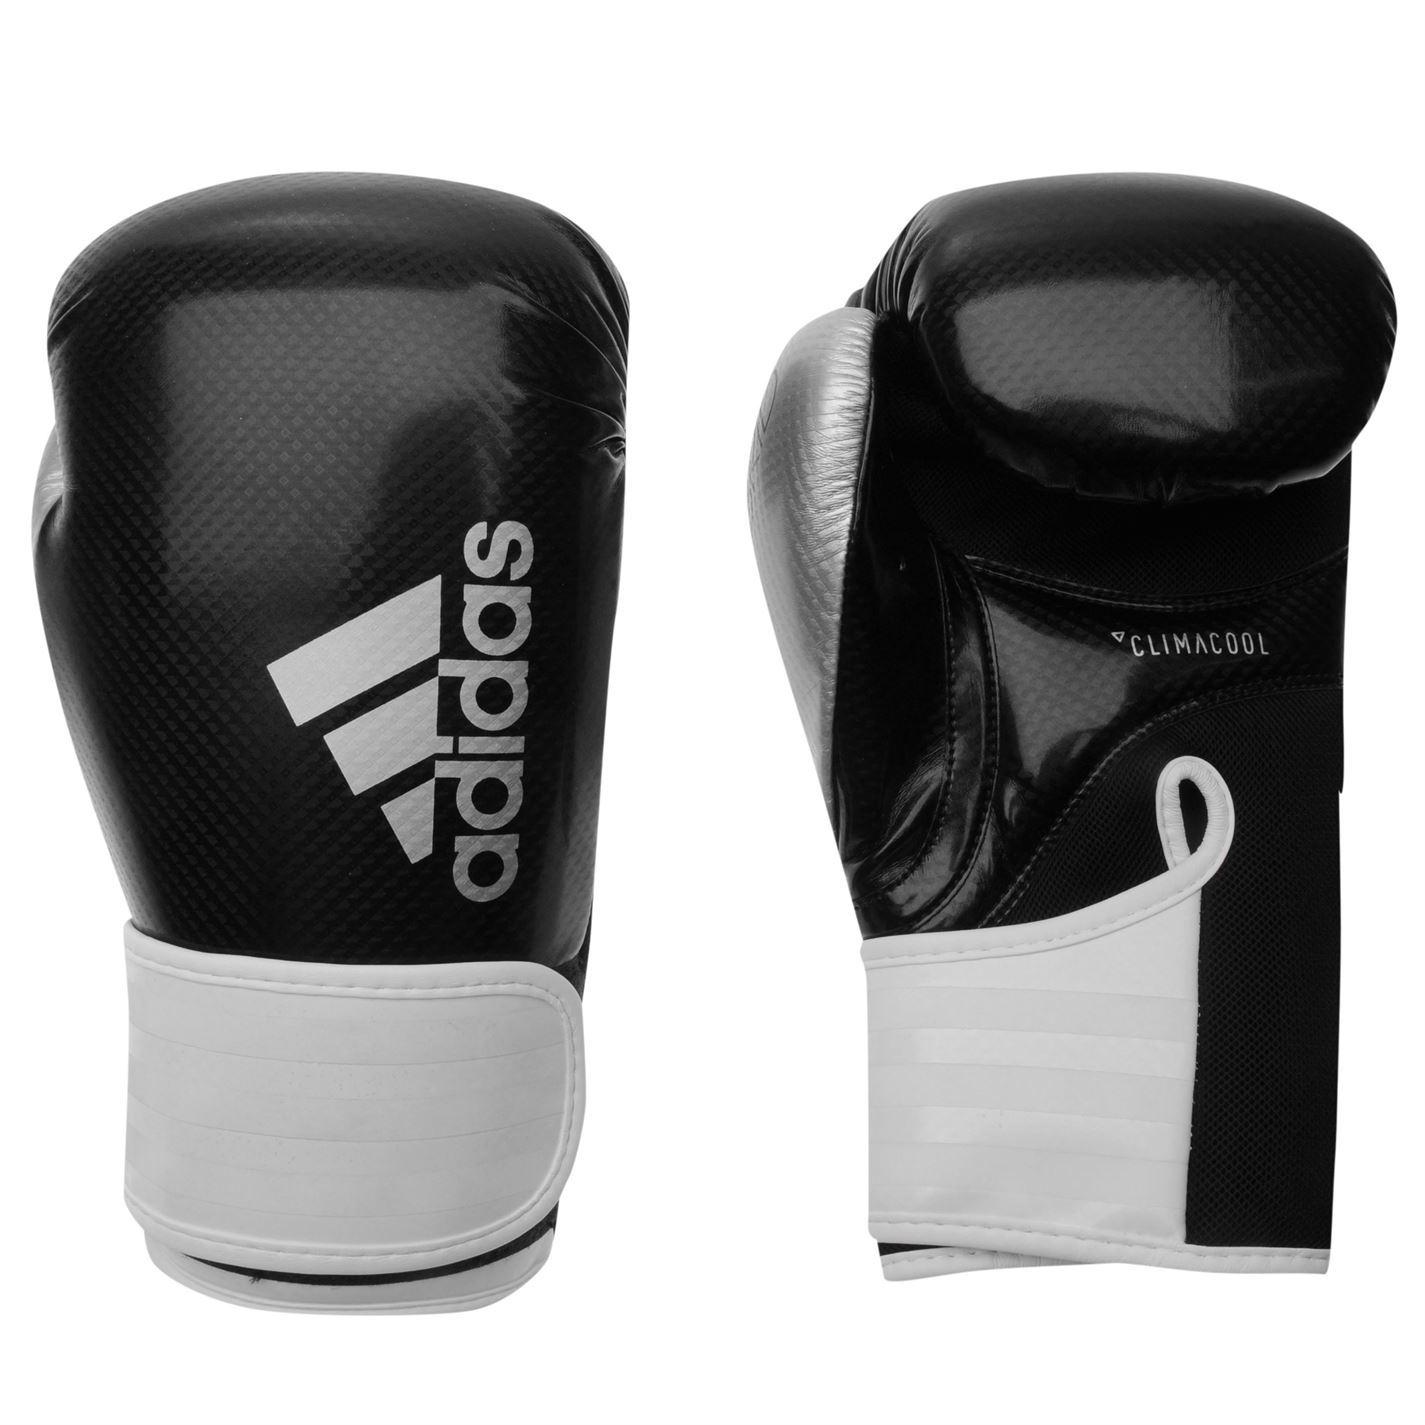 guantoni boxe adidas climacool